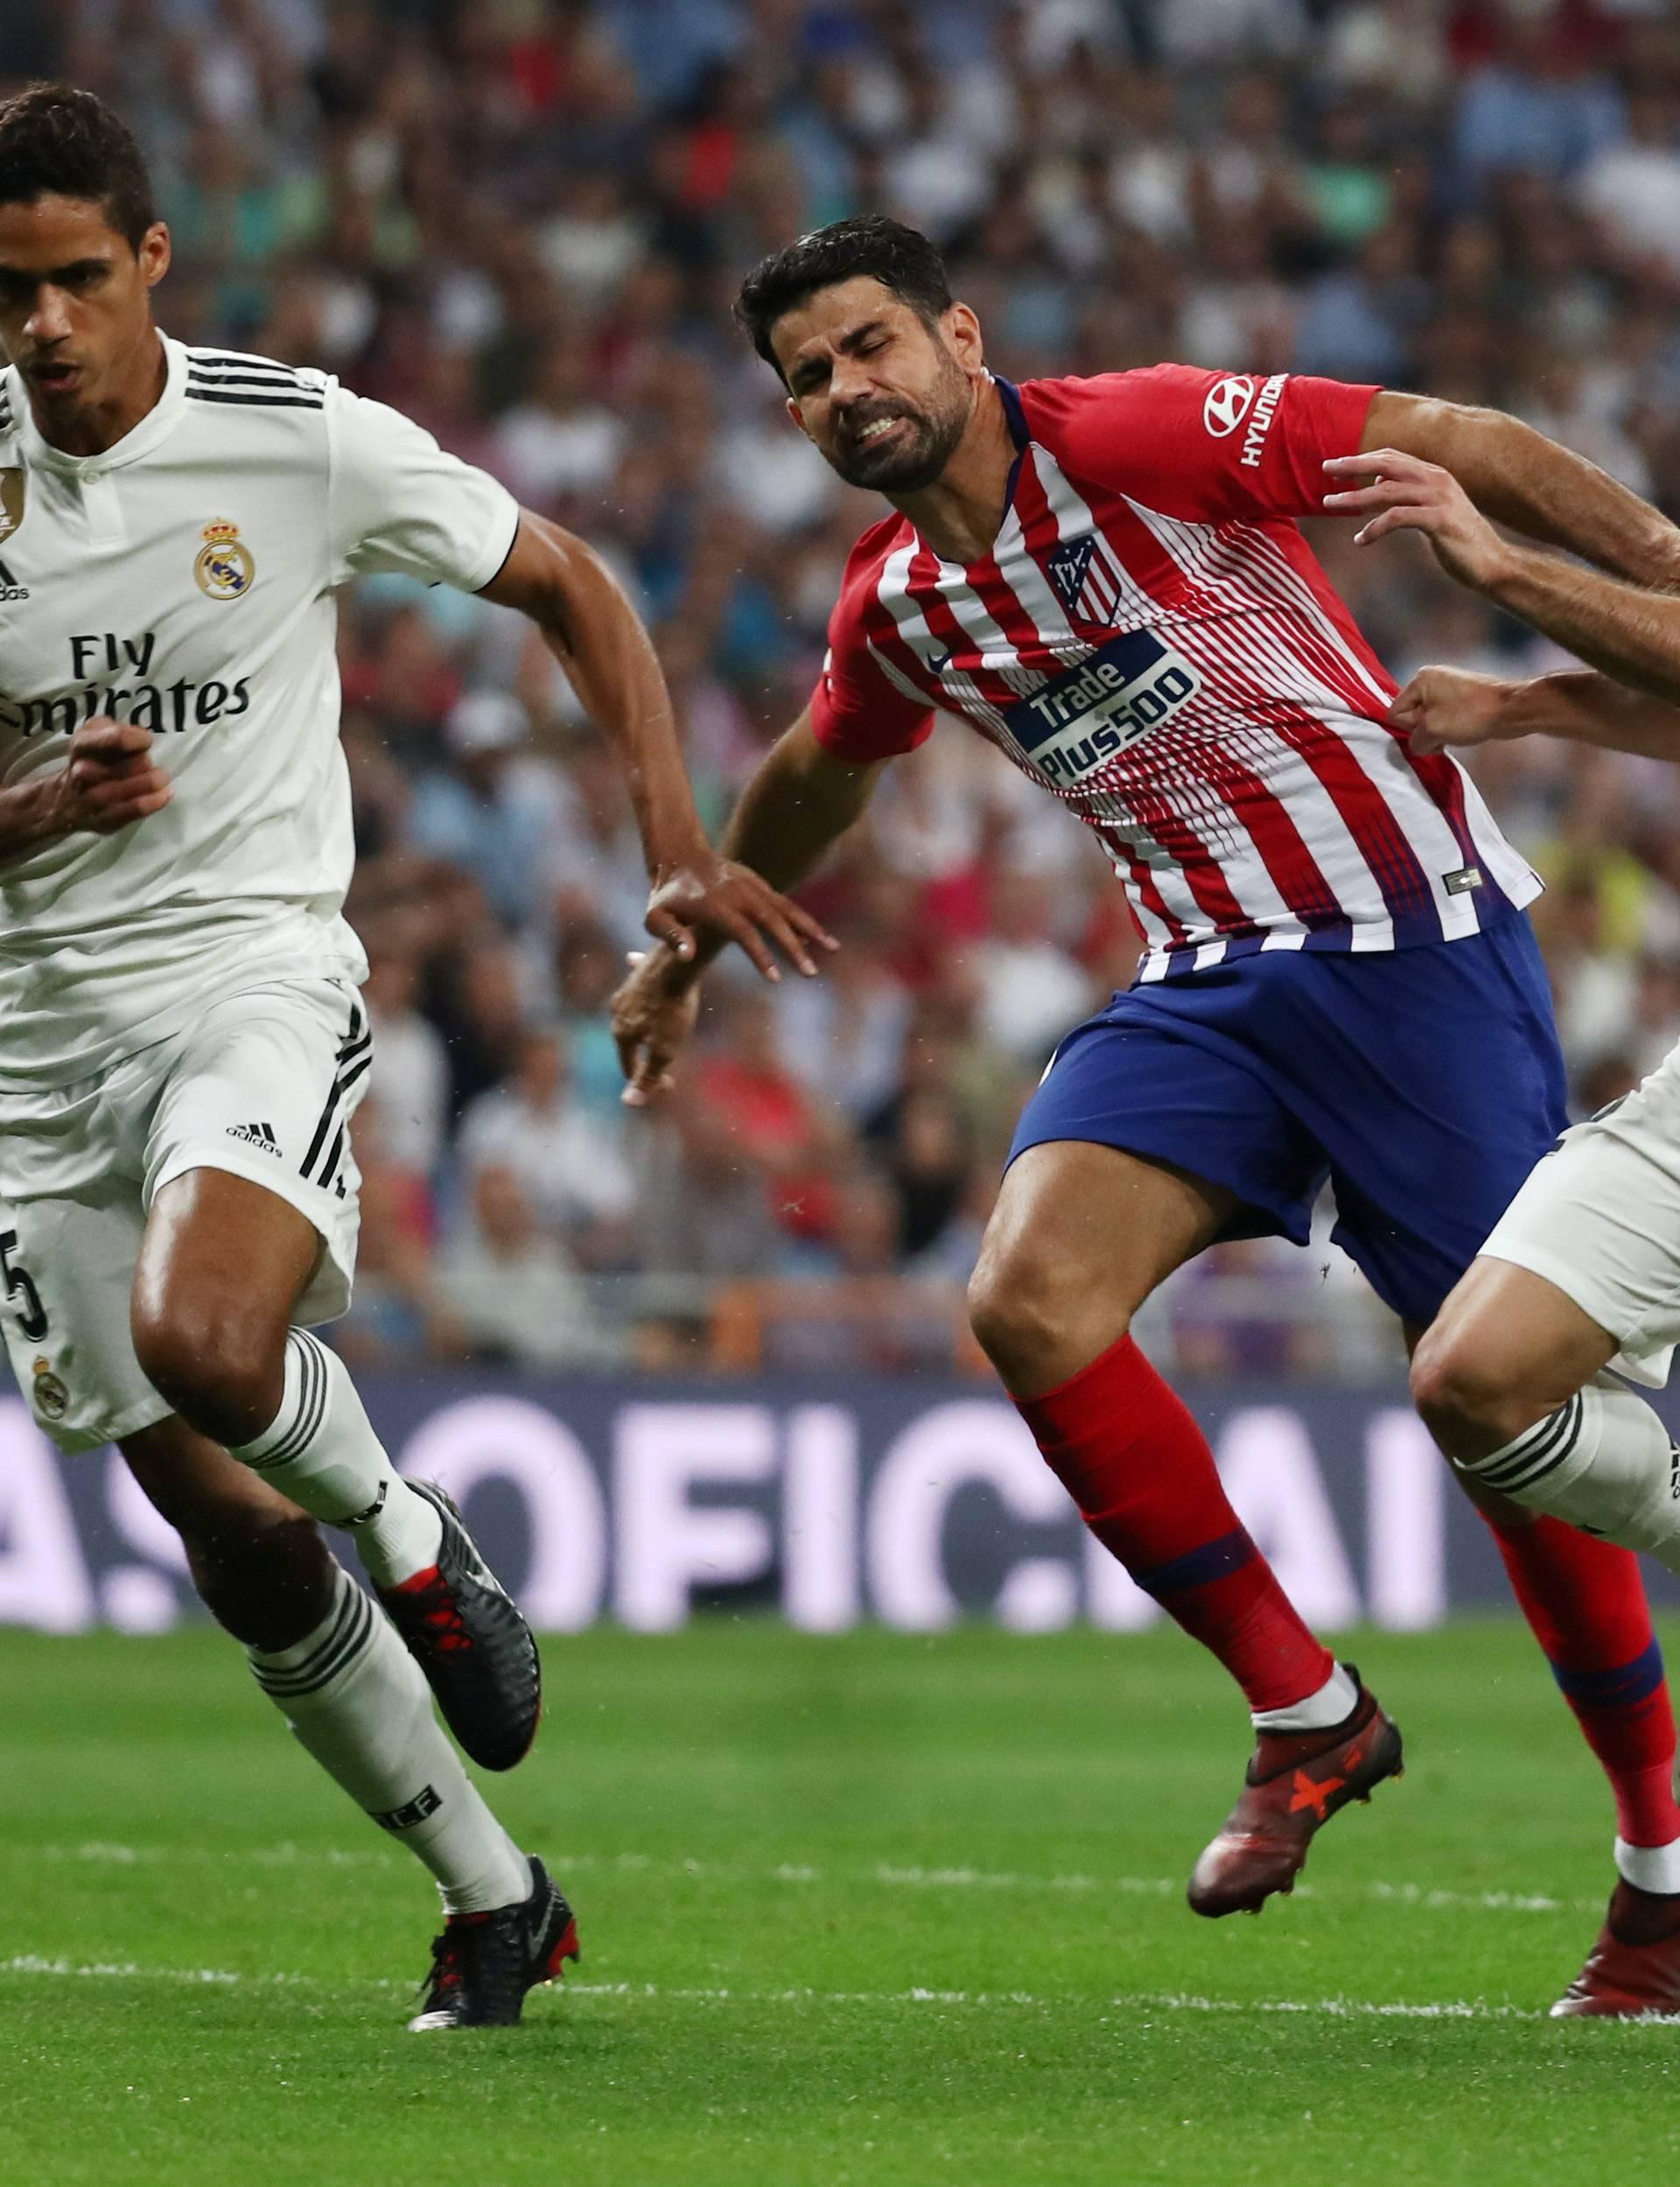 La Liga Santander - Real Madrid v Atletico Madrid